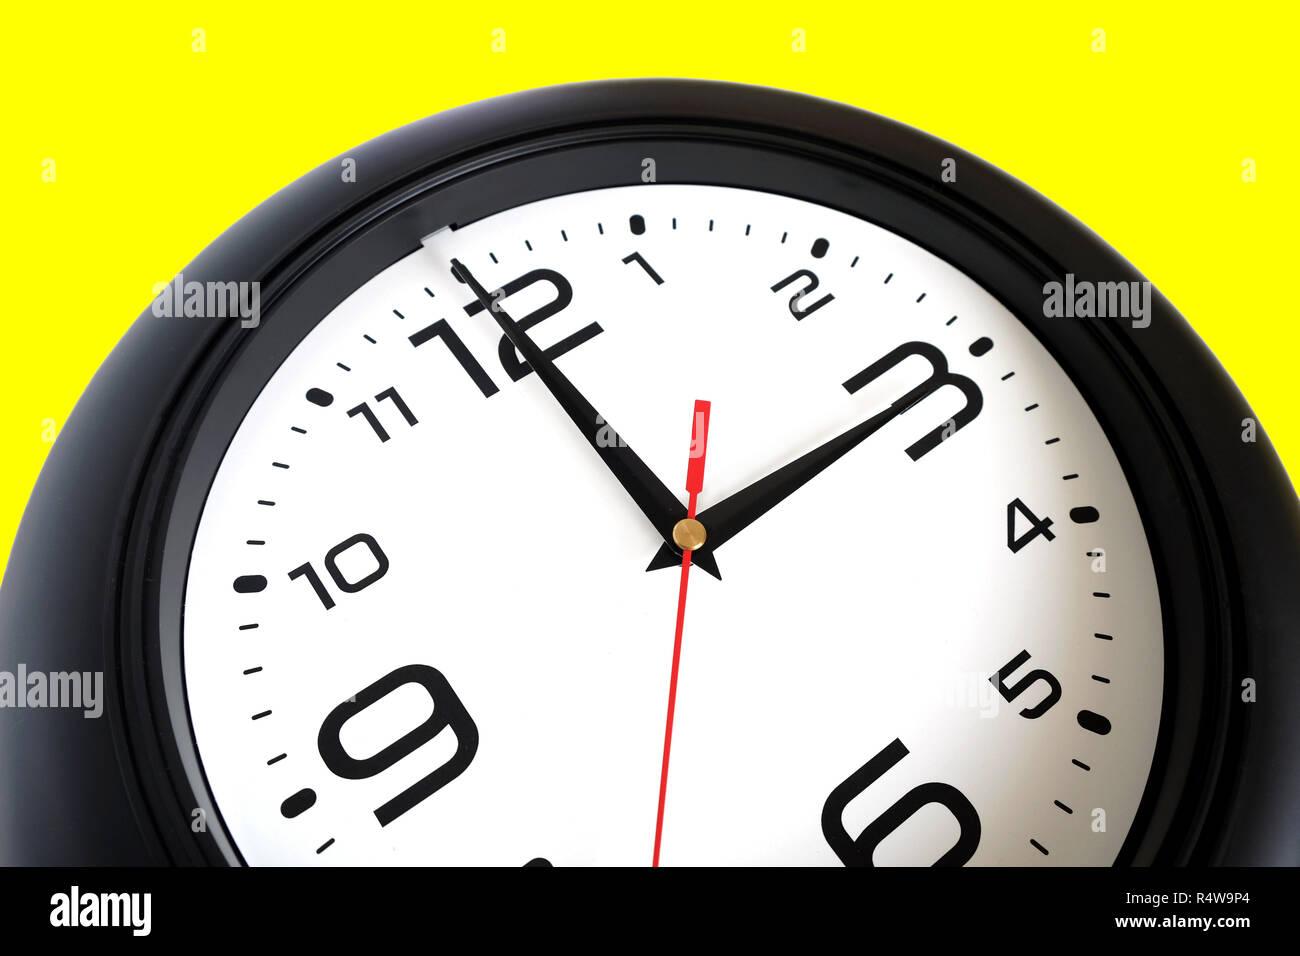 f81fe06a986f Fragmento de reloj de pared redondo grande con un borde de color negro  sobre fondo blanco